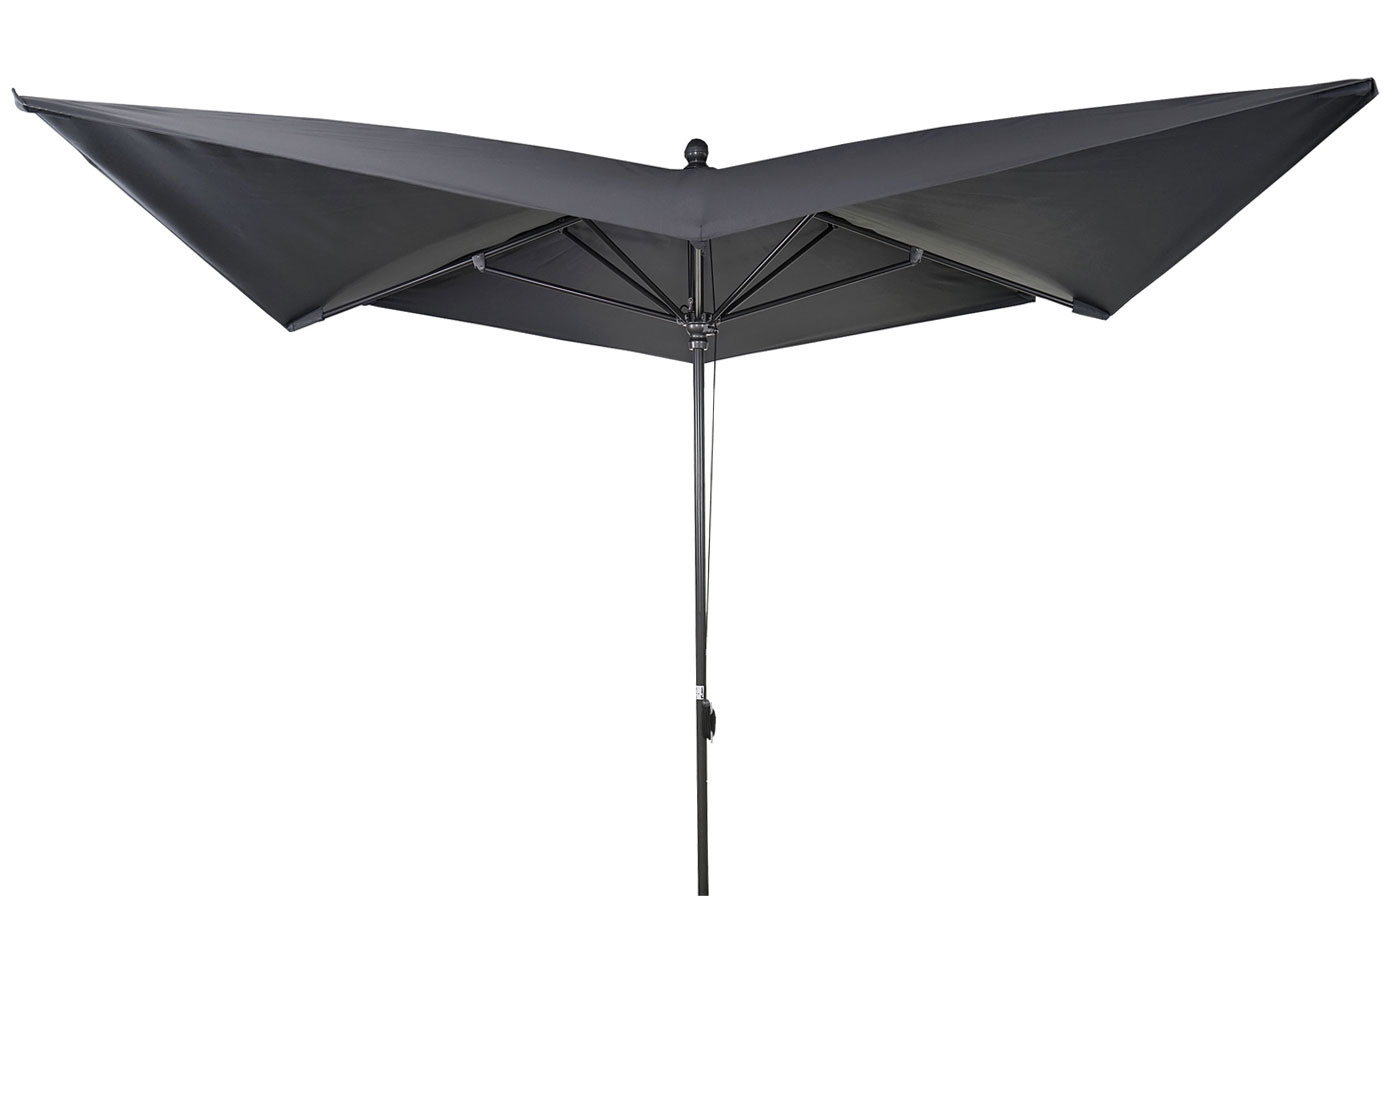 luxus sonnenschirm marktschirm gartenschirm 3x3m 4 24m. Black Bedroom Furniture Sets. Home Design Ideas